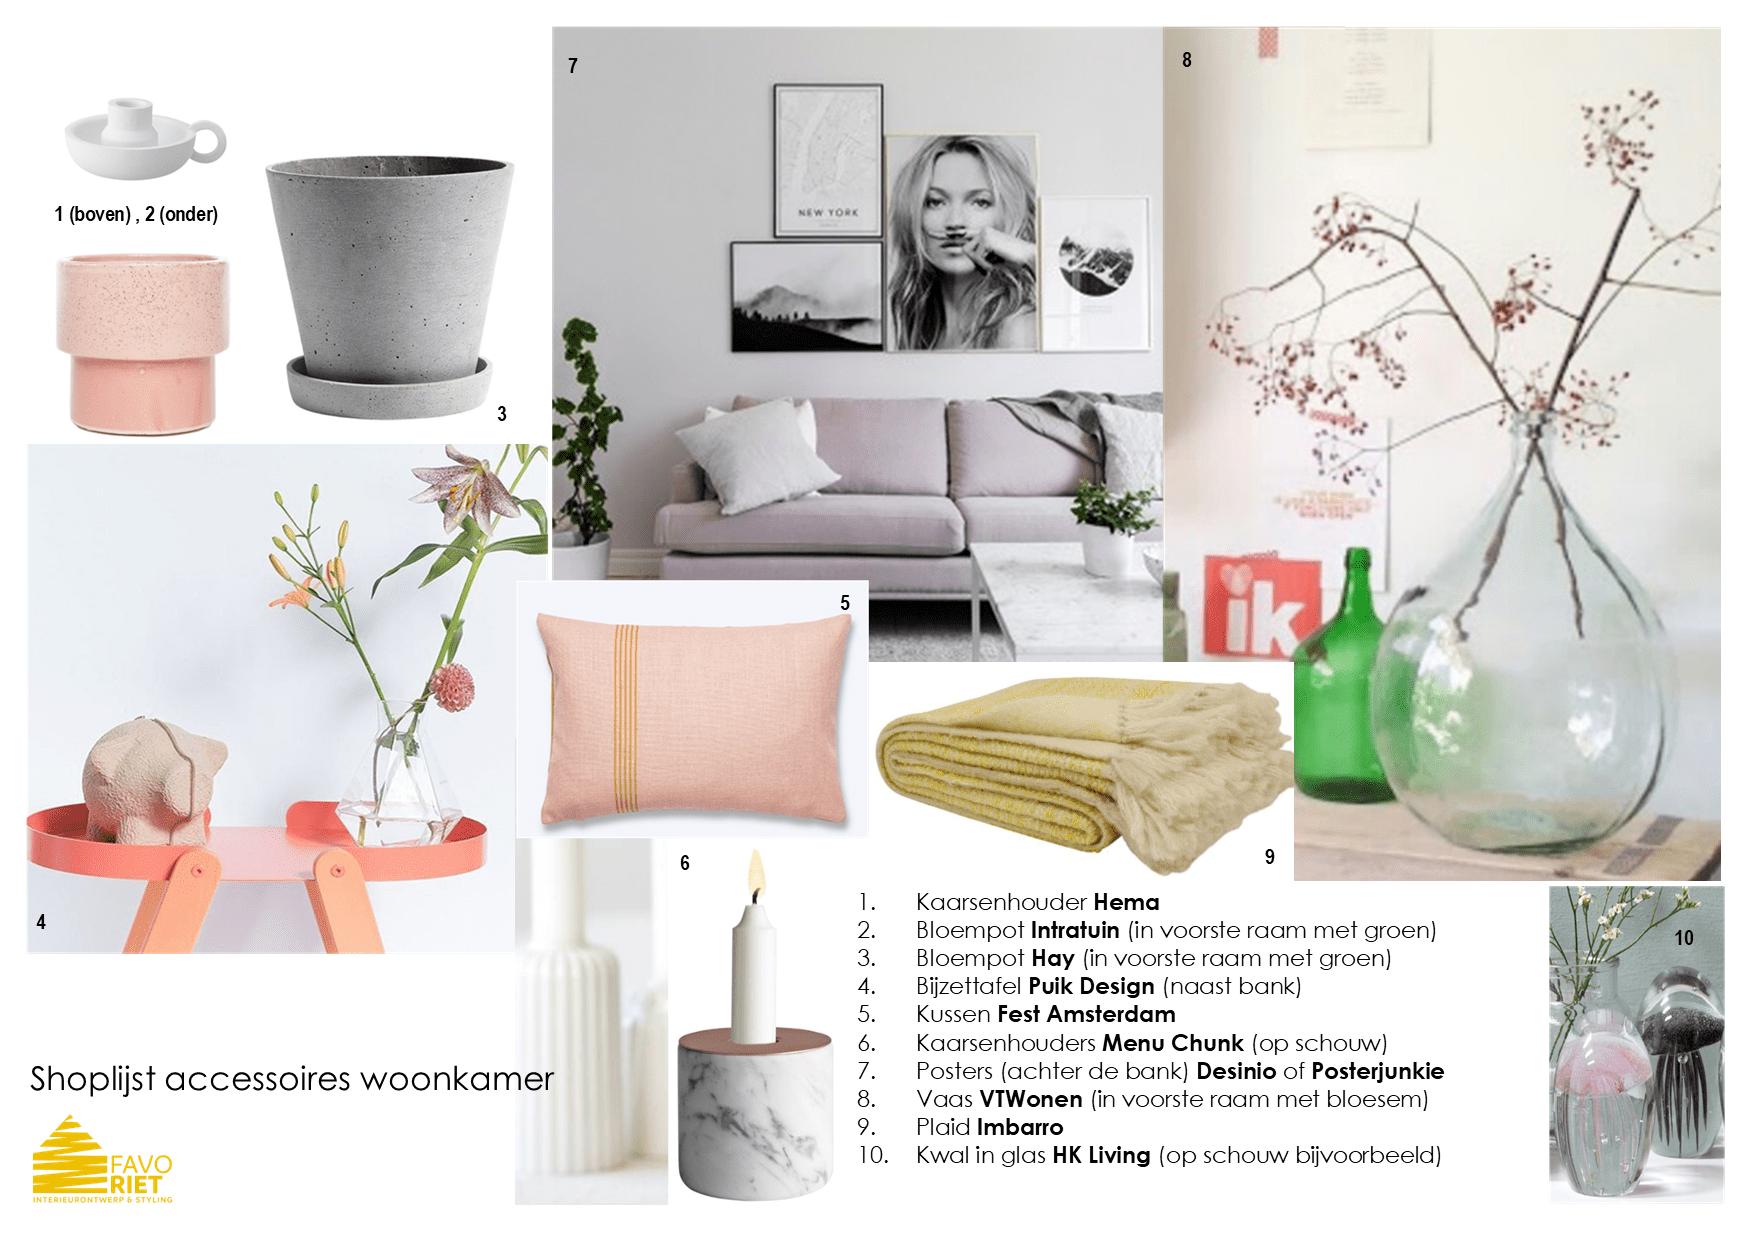 shoplijst woonkamer accessoires